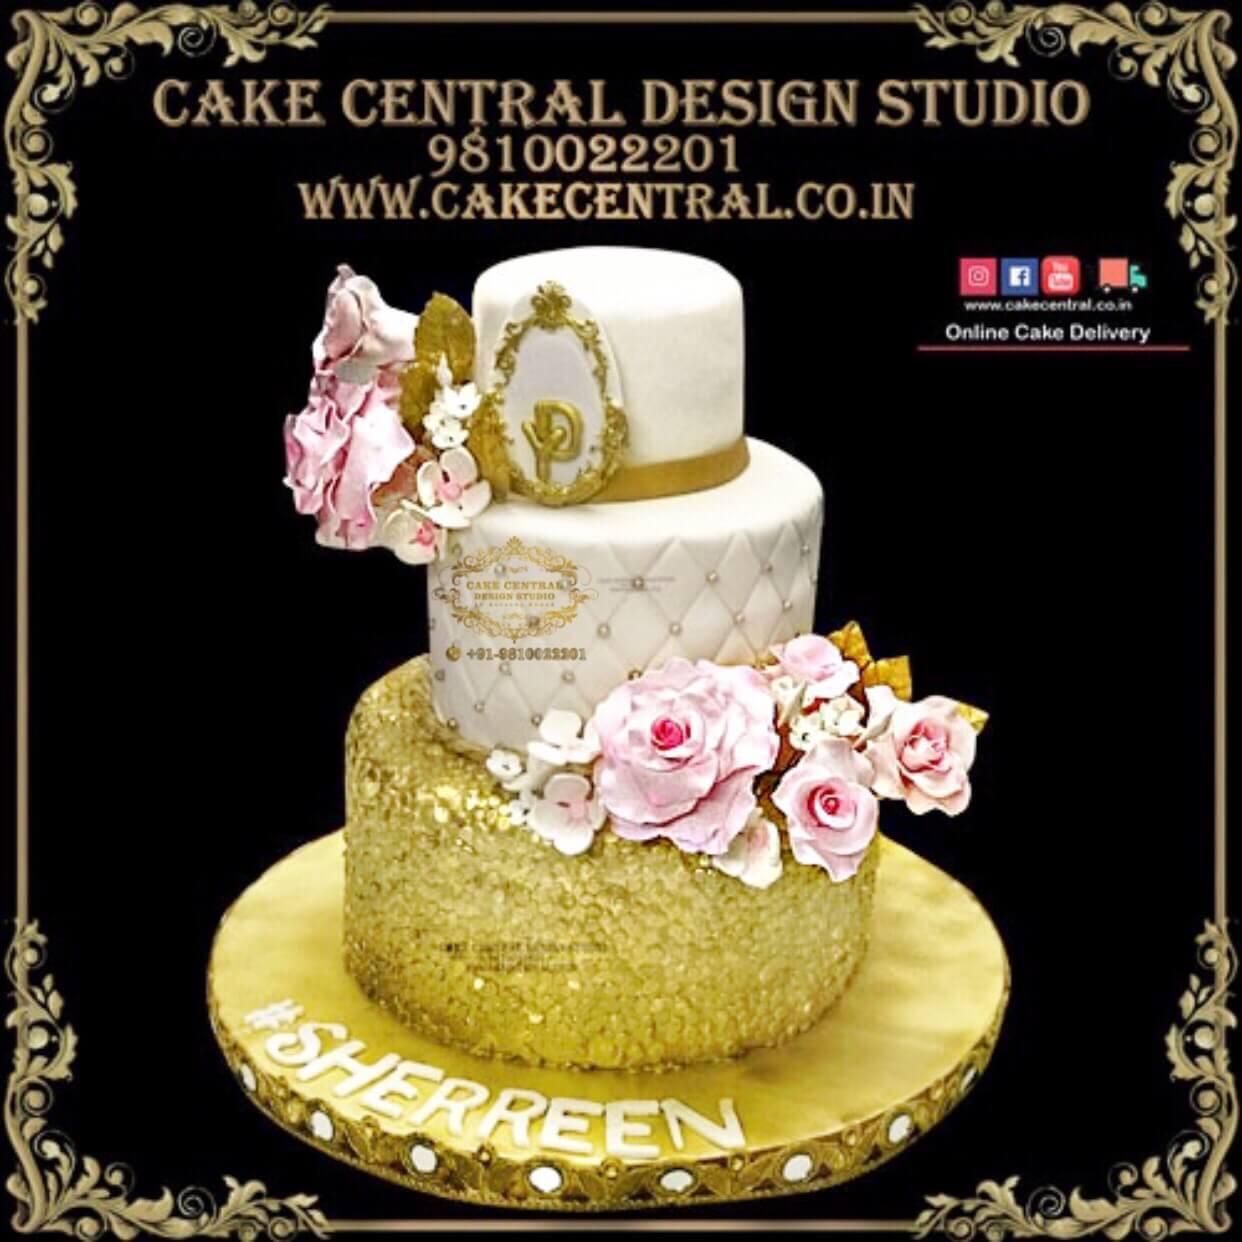 Wedding Cakes in Delhi NCR | Buy Best Designer Wedding Cakes Online